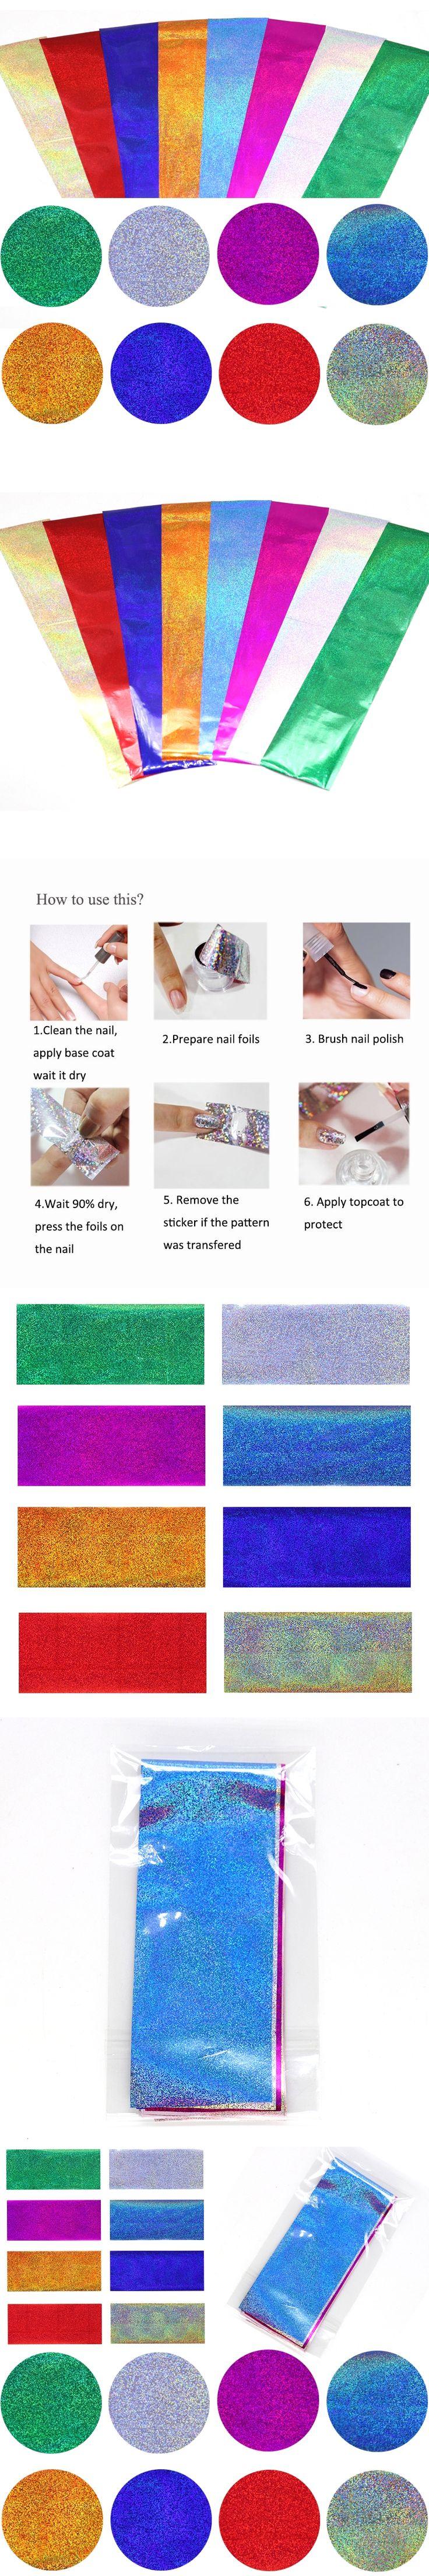 8Pcs/Set Holographic Nail Foils 20*4cm Laser Fine Sand Glitter Nails Art Transfer Stickers Manicure Nail Art Decorations Tips